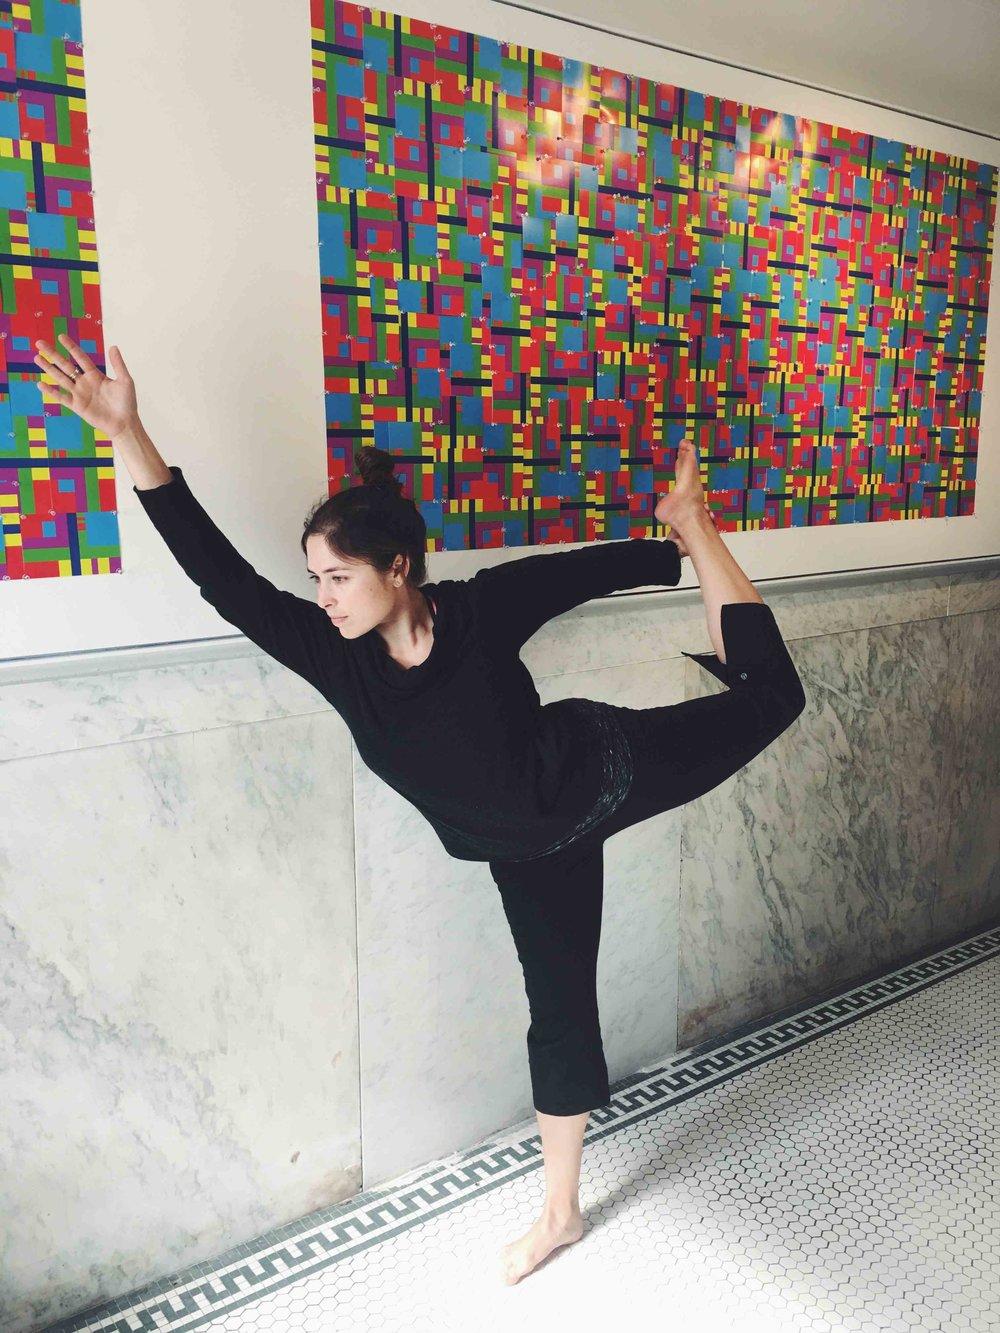 Yoga with Art